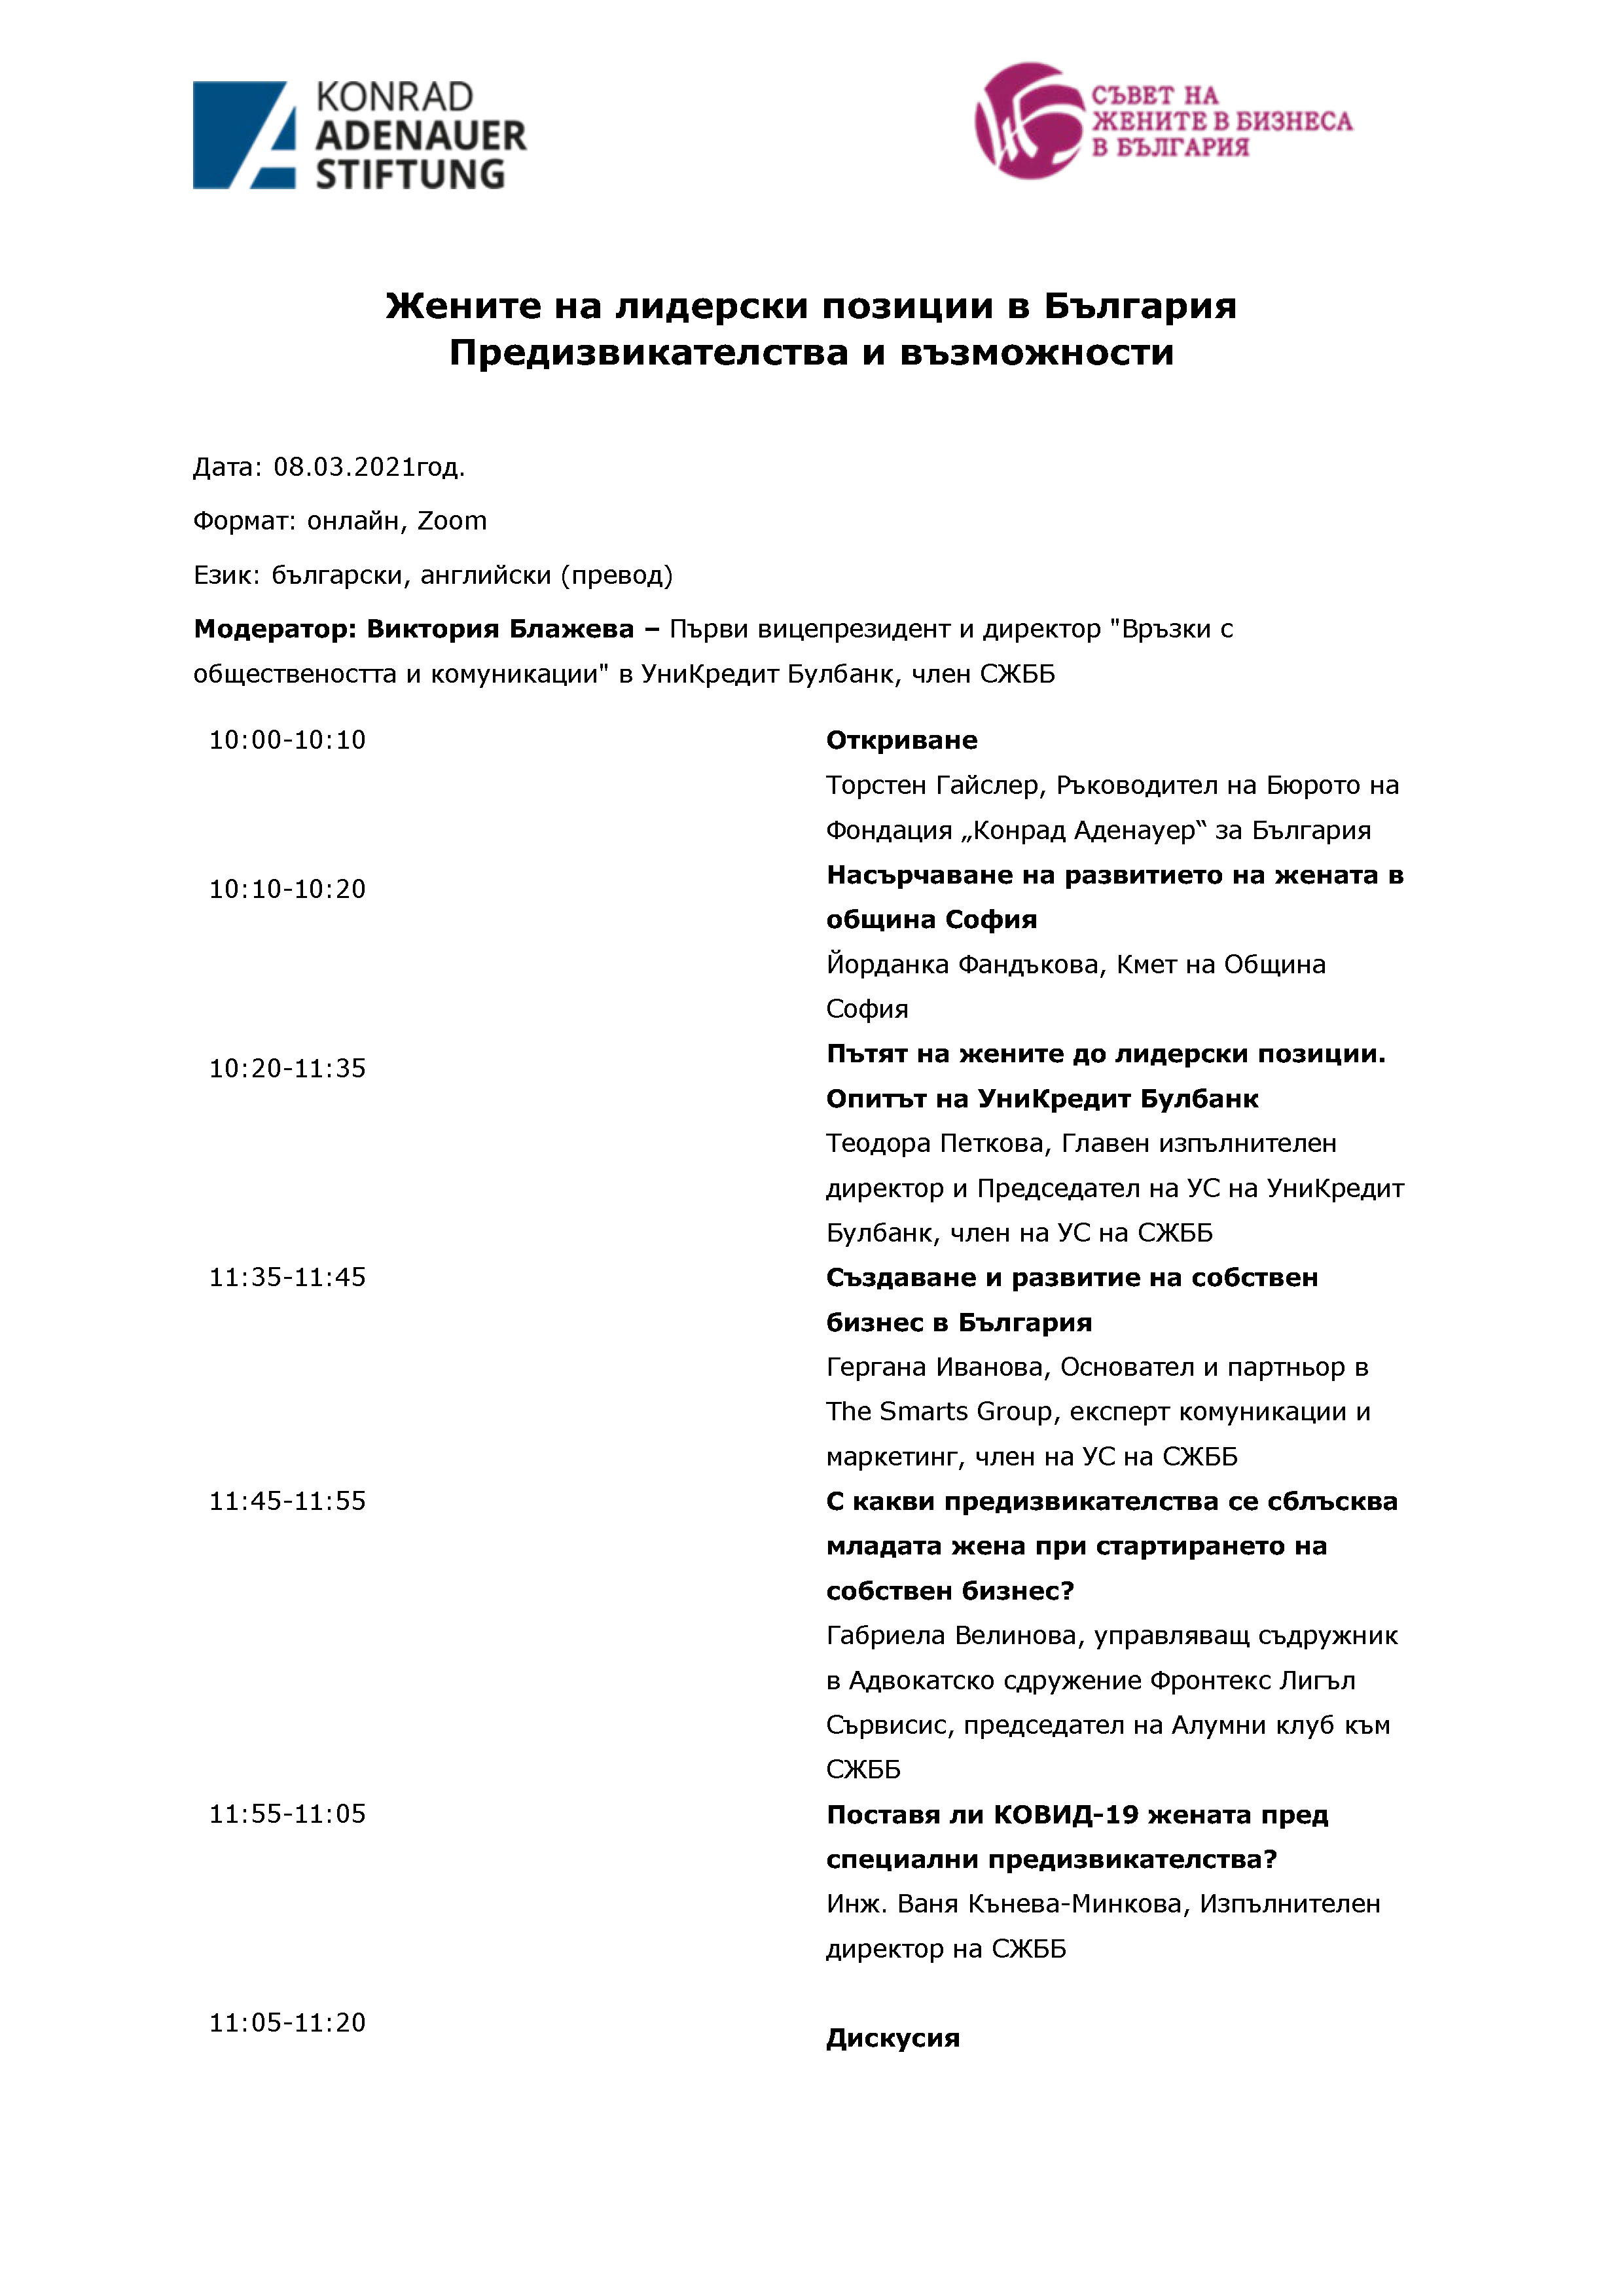 DRAFT PR BG Жените на лидерски позиции в България_v06